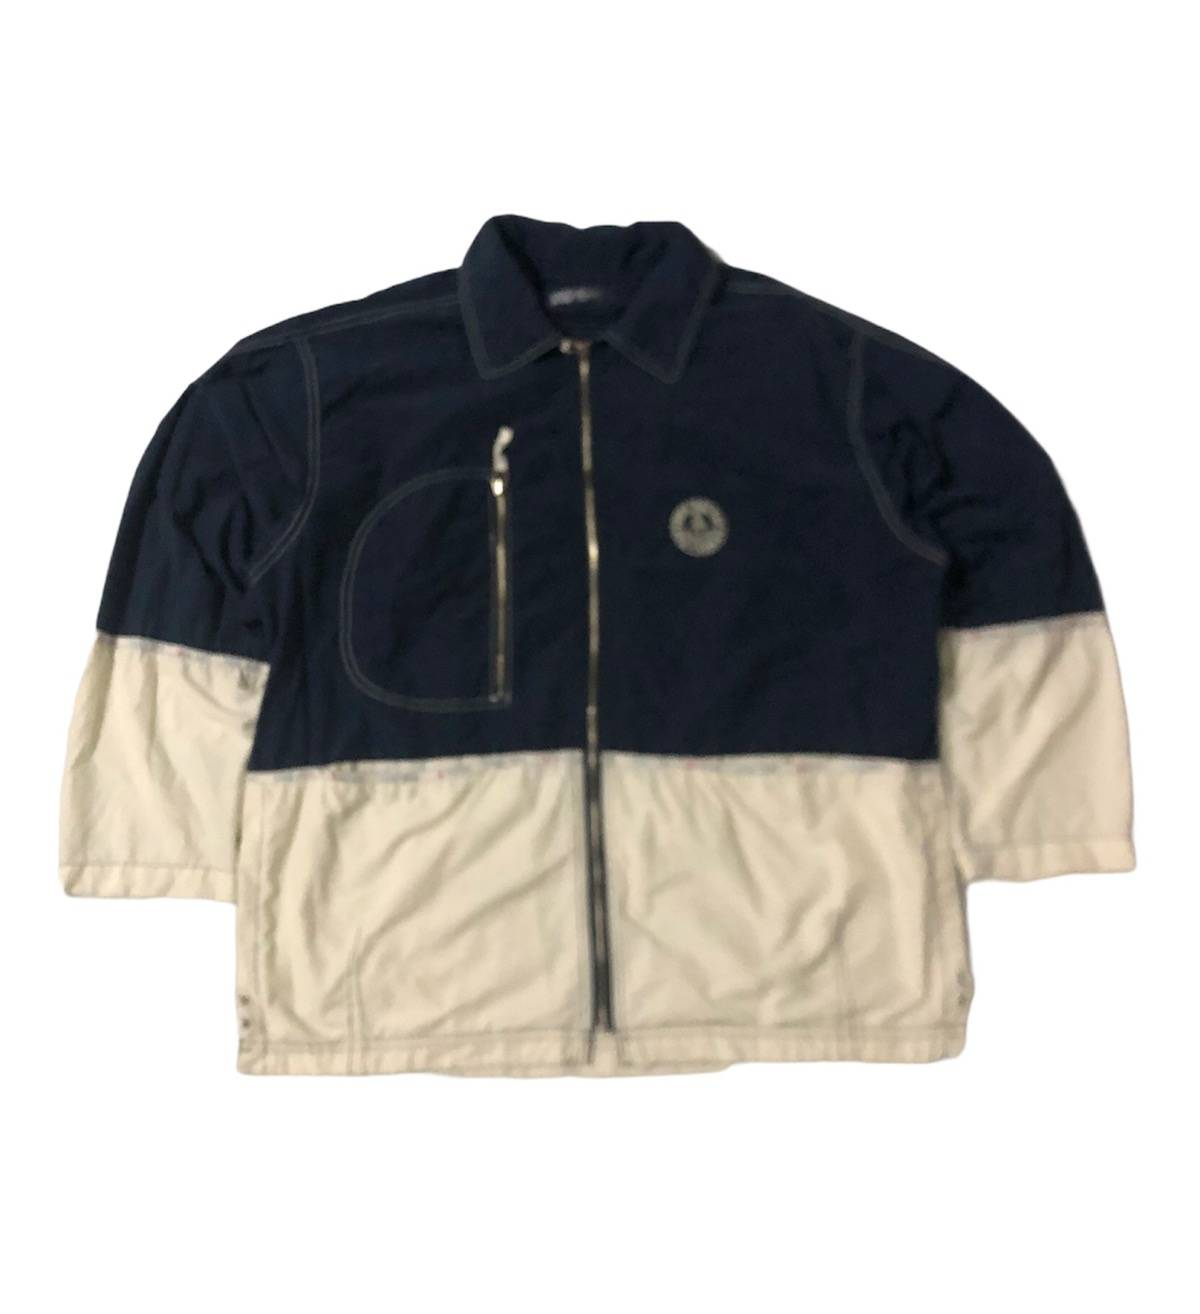 Naf Naf Green Zip Up Light Jacket  Sports Fashion 90/'s Style  Women/'s Size EUUS SM  cigesshop  SALE